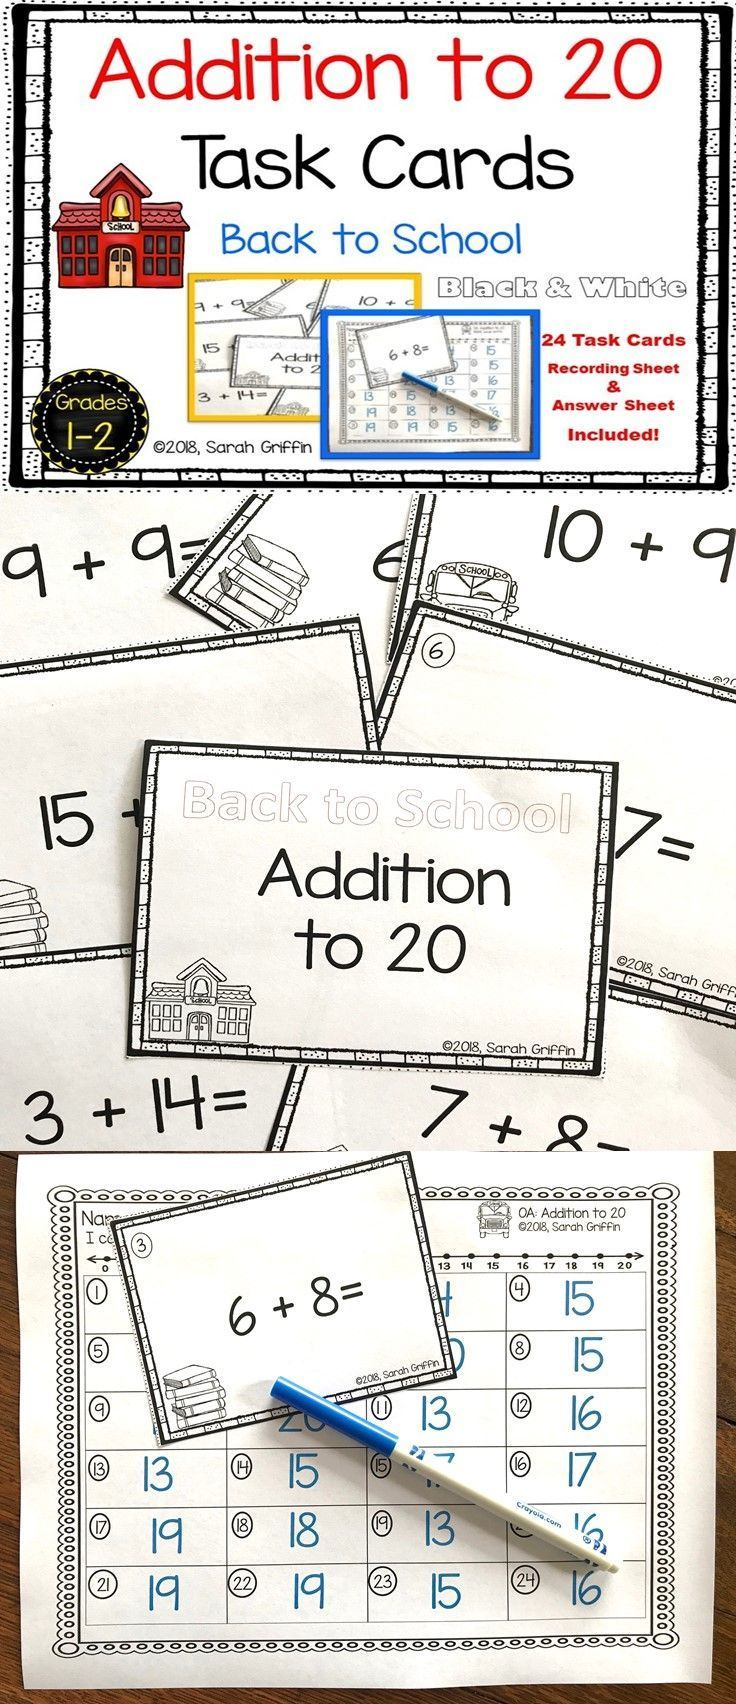 Großartig Frei Bedruckbare Kindergarten Bildungsprintables Kinder ...